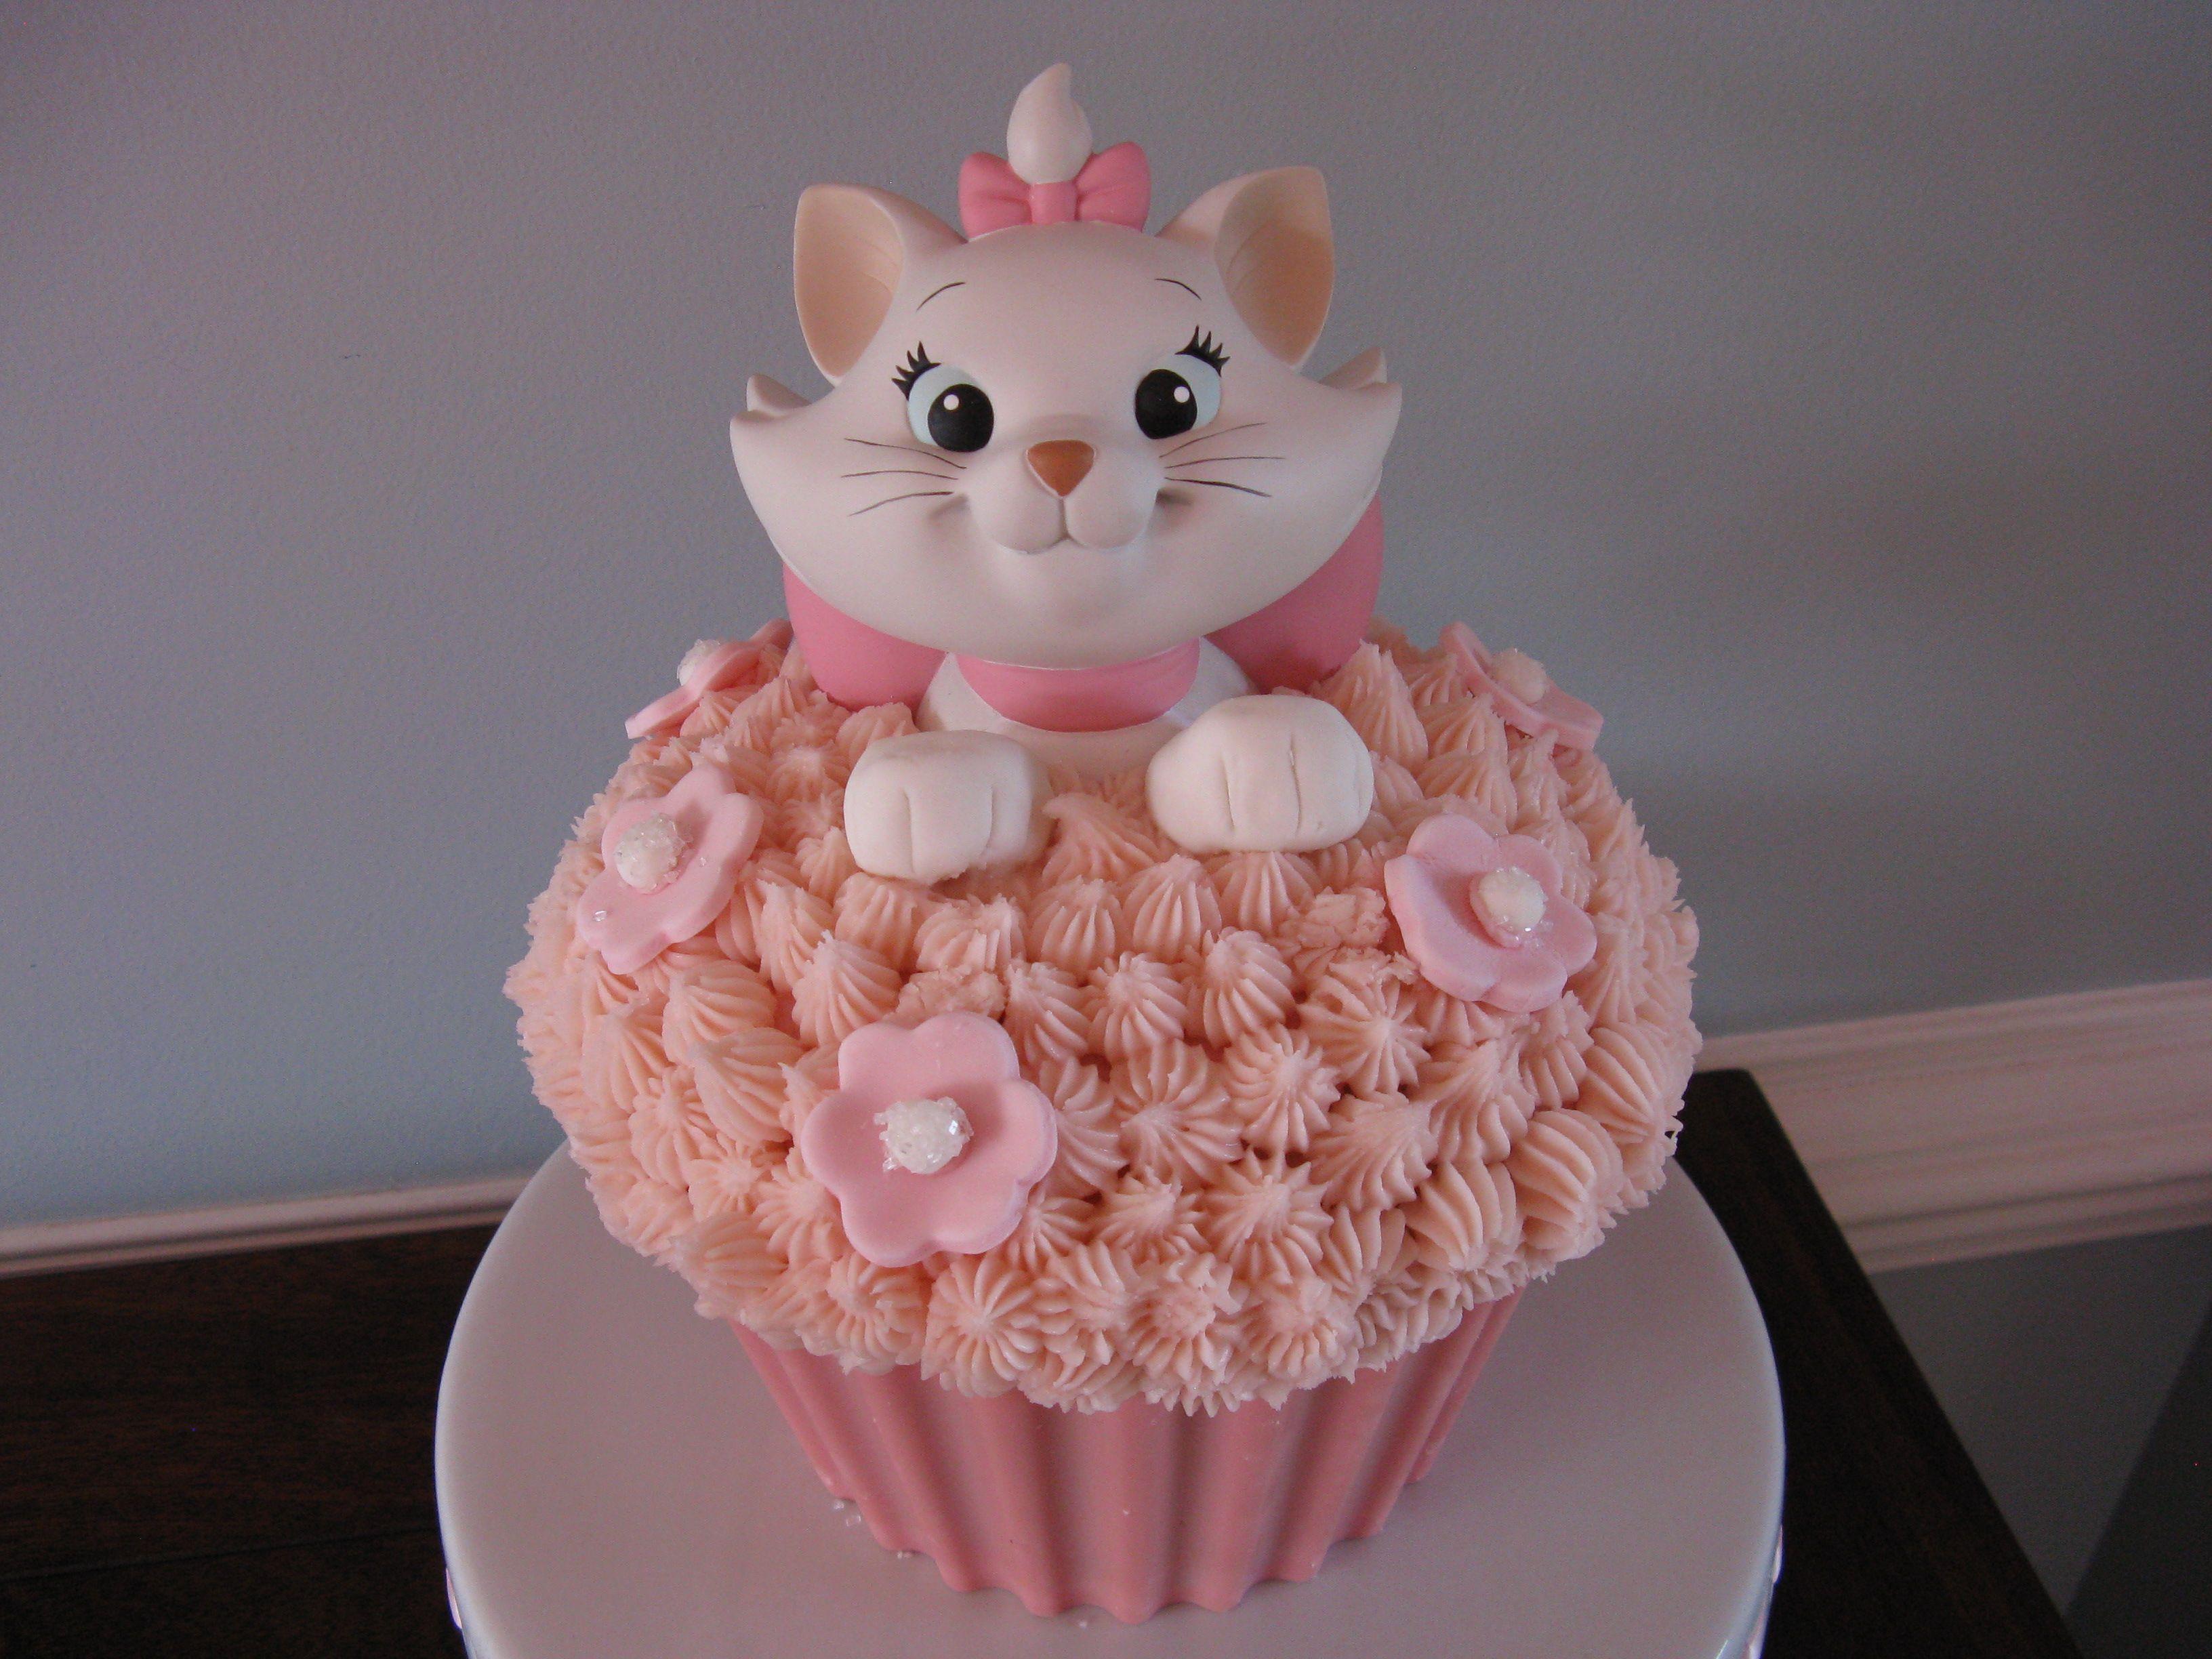 Marie Cake Yo Quiero Uno Asi Cat Cake Disney Cakes Cake